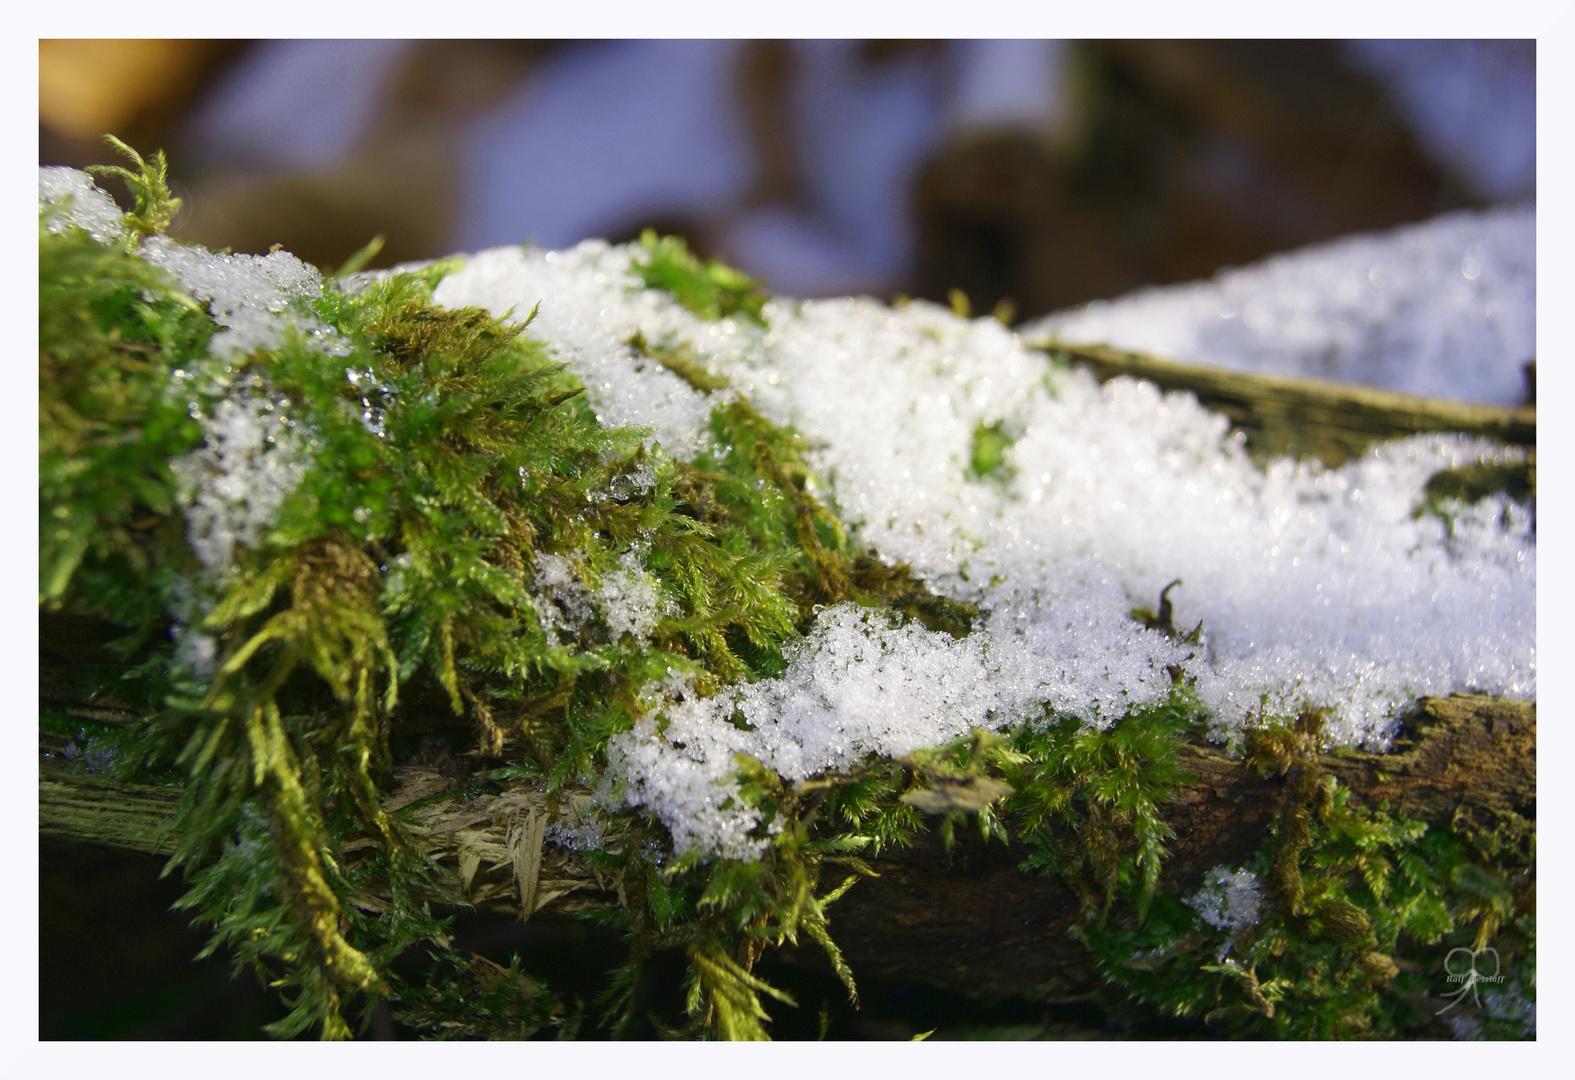 Winterliche Impressionen...